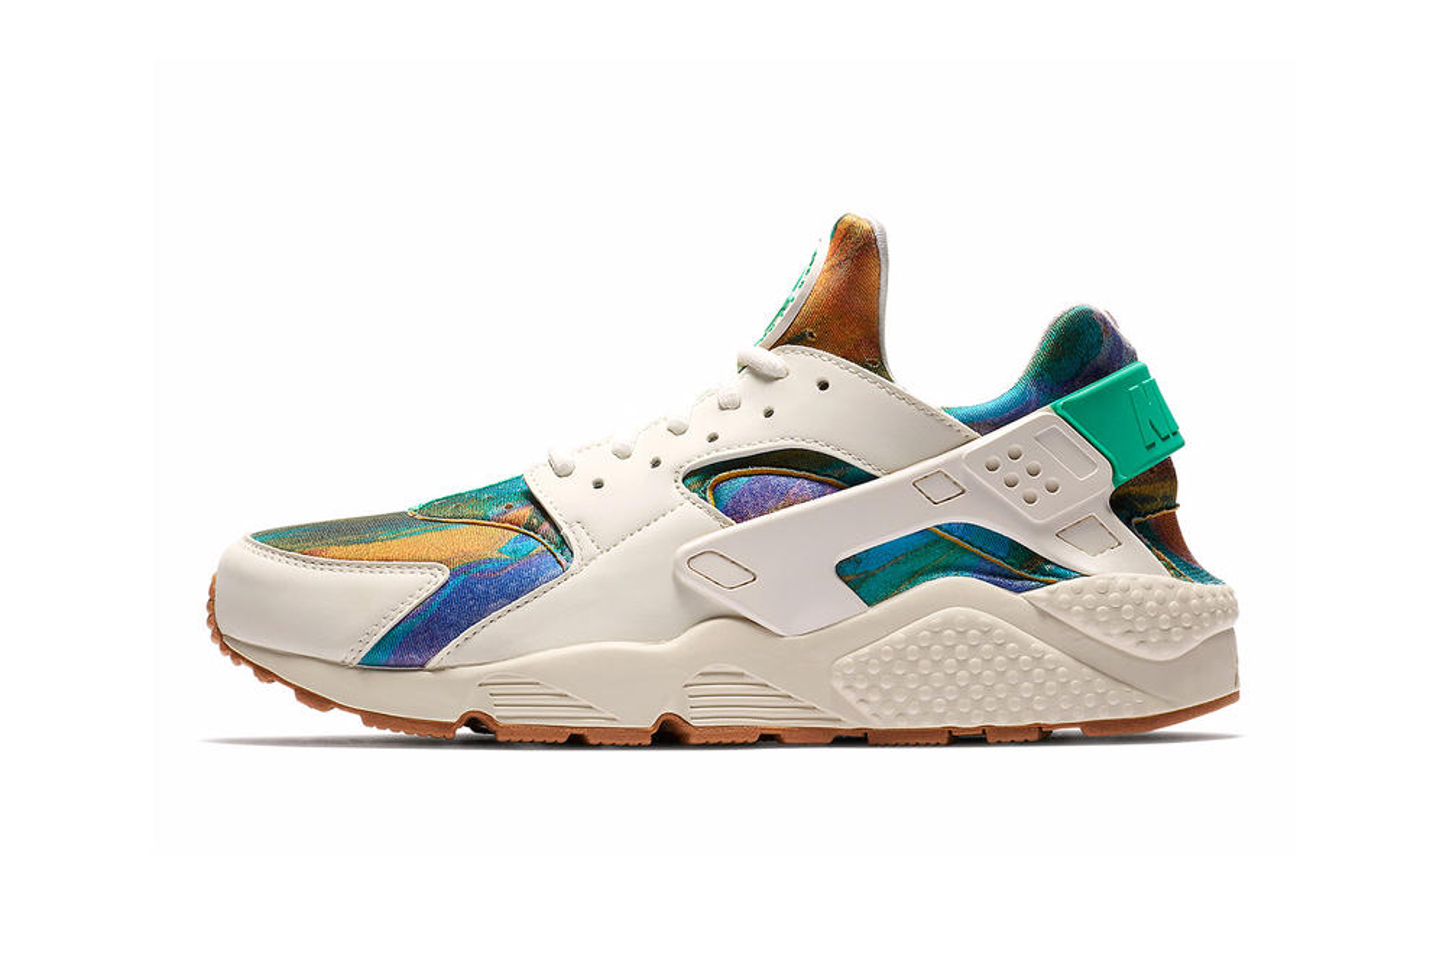 Nike Brings Colorful New Prints to the Huarache & Vandal